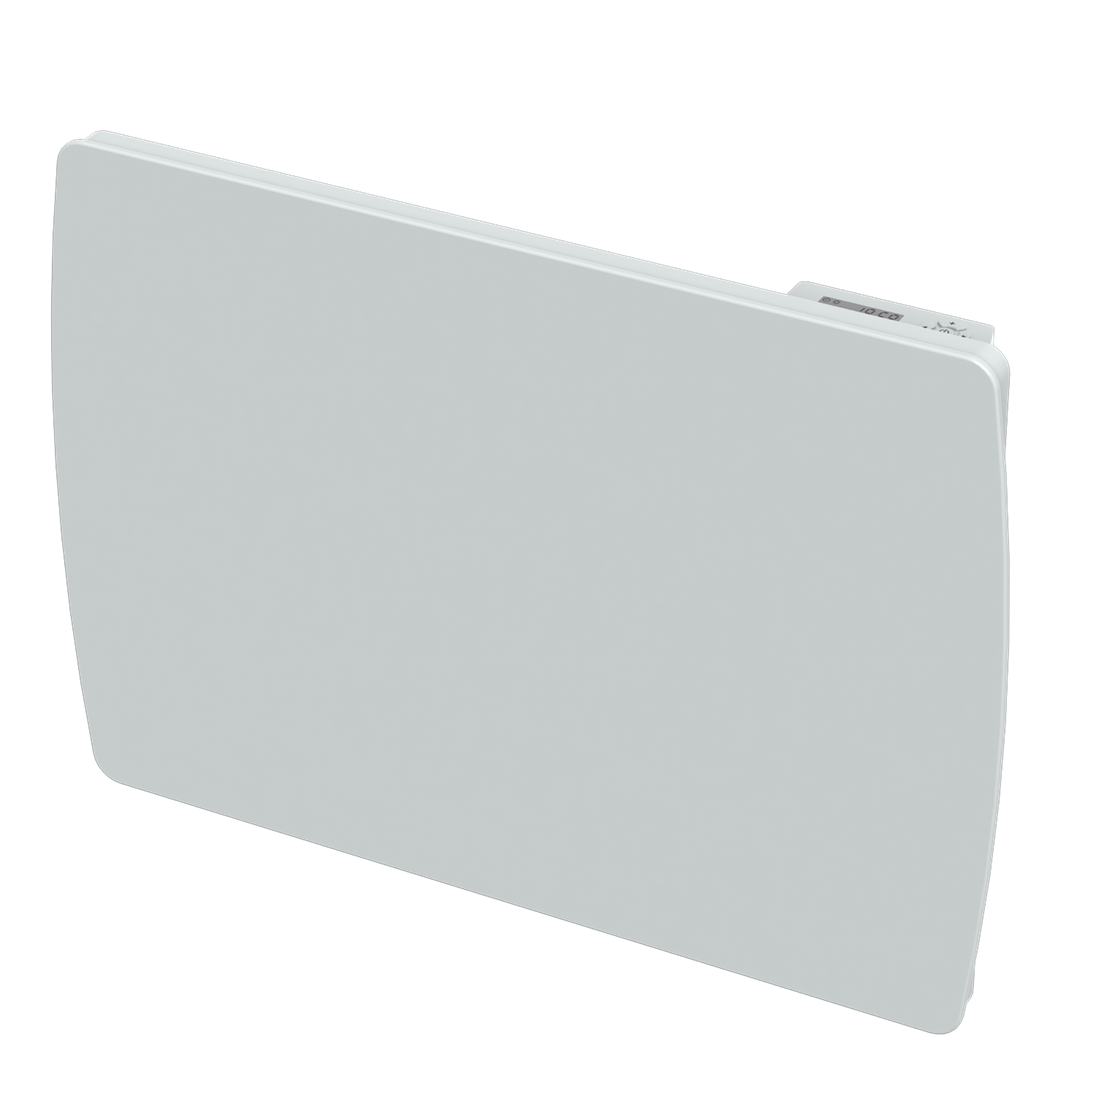 CARRERA - Radiateur inertie à cœur céramique - Verre blanc -1000W- LCD